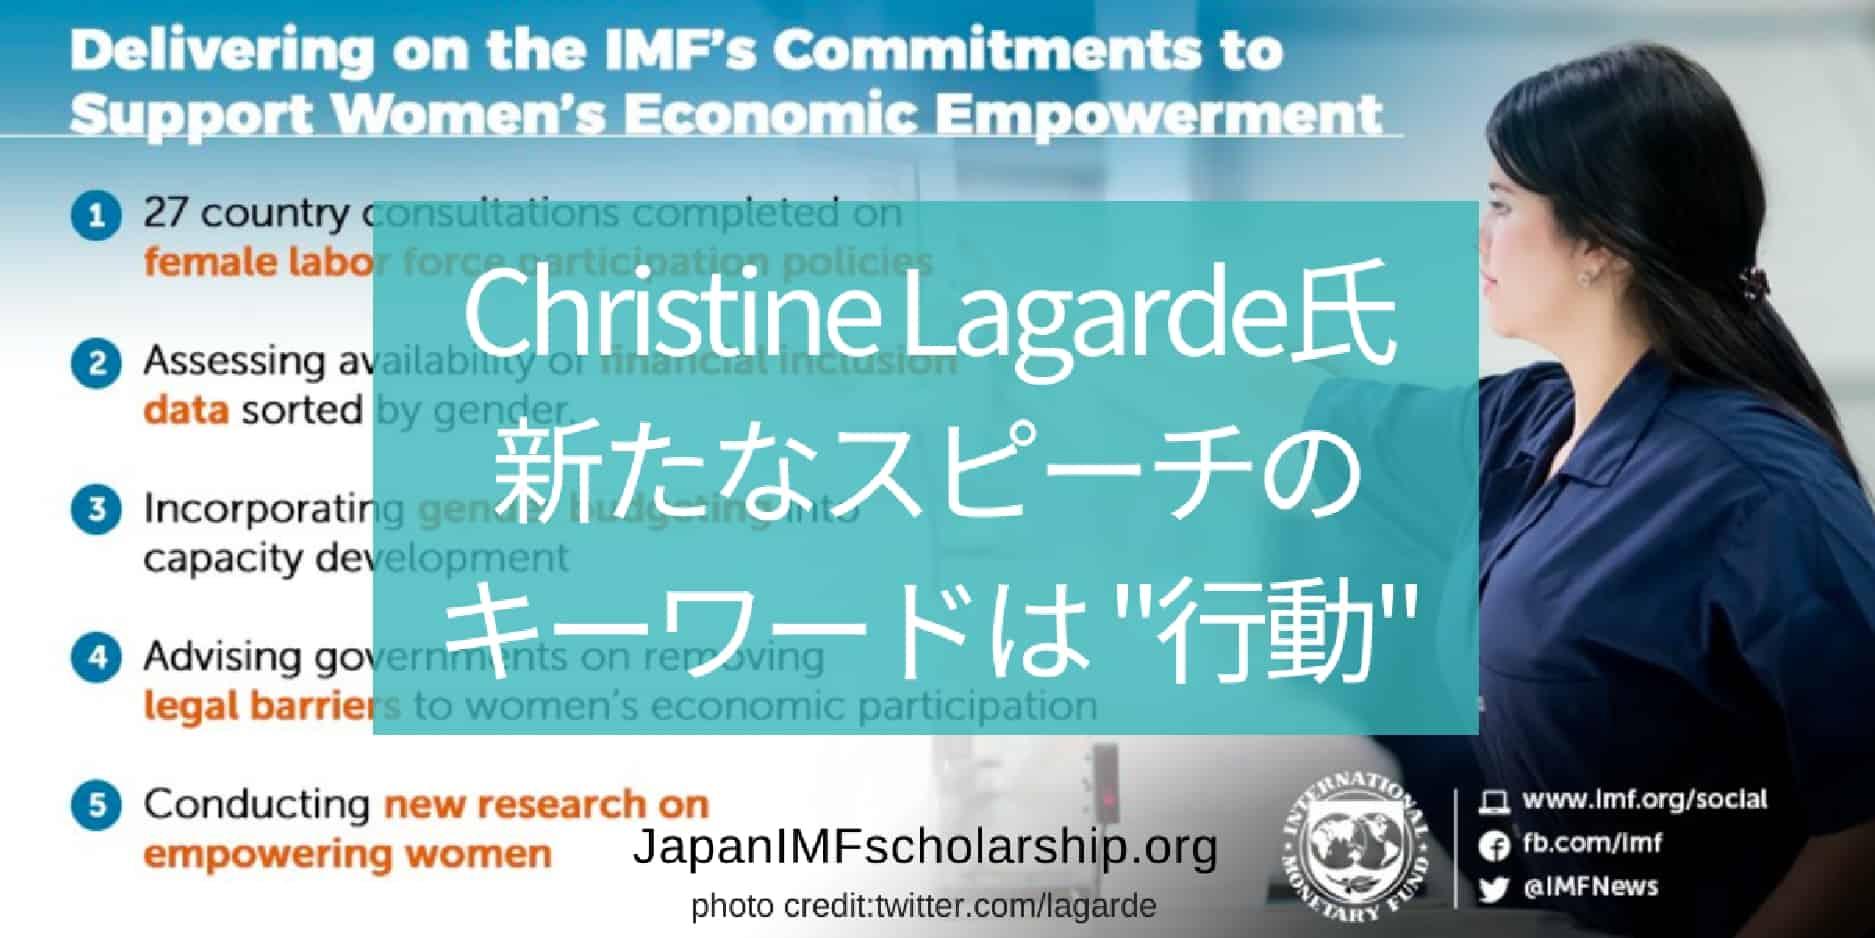 jisp web-fb imf speech by christine lagarde keyword is action